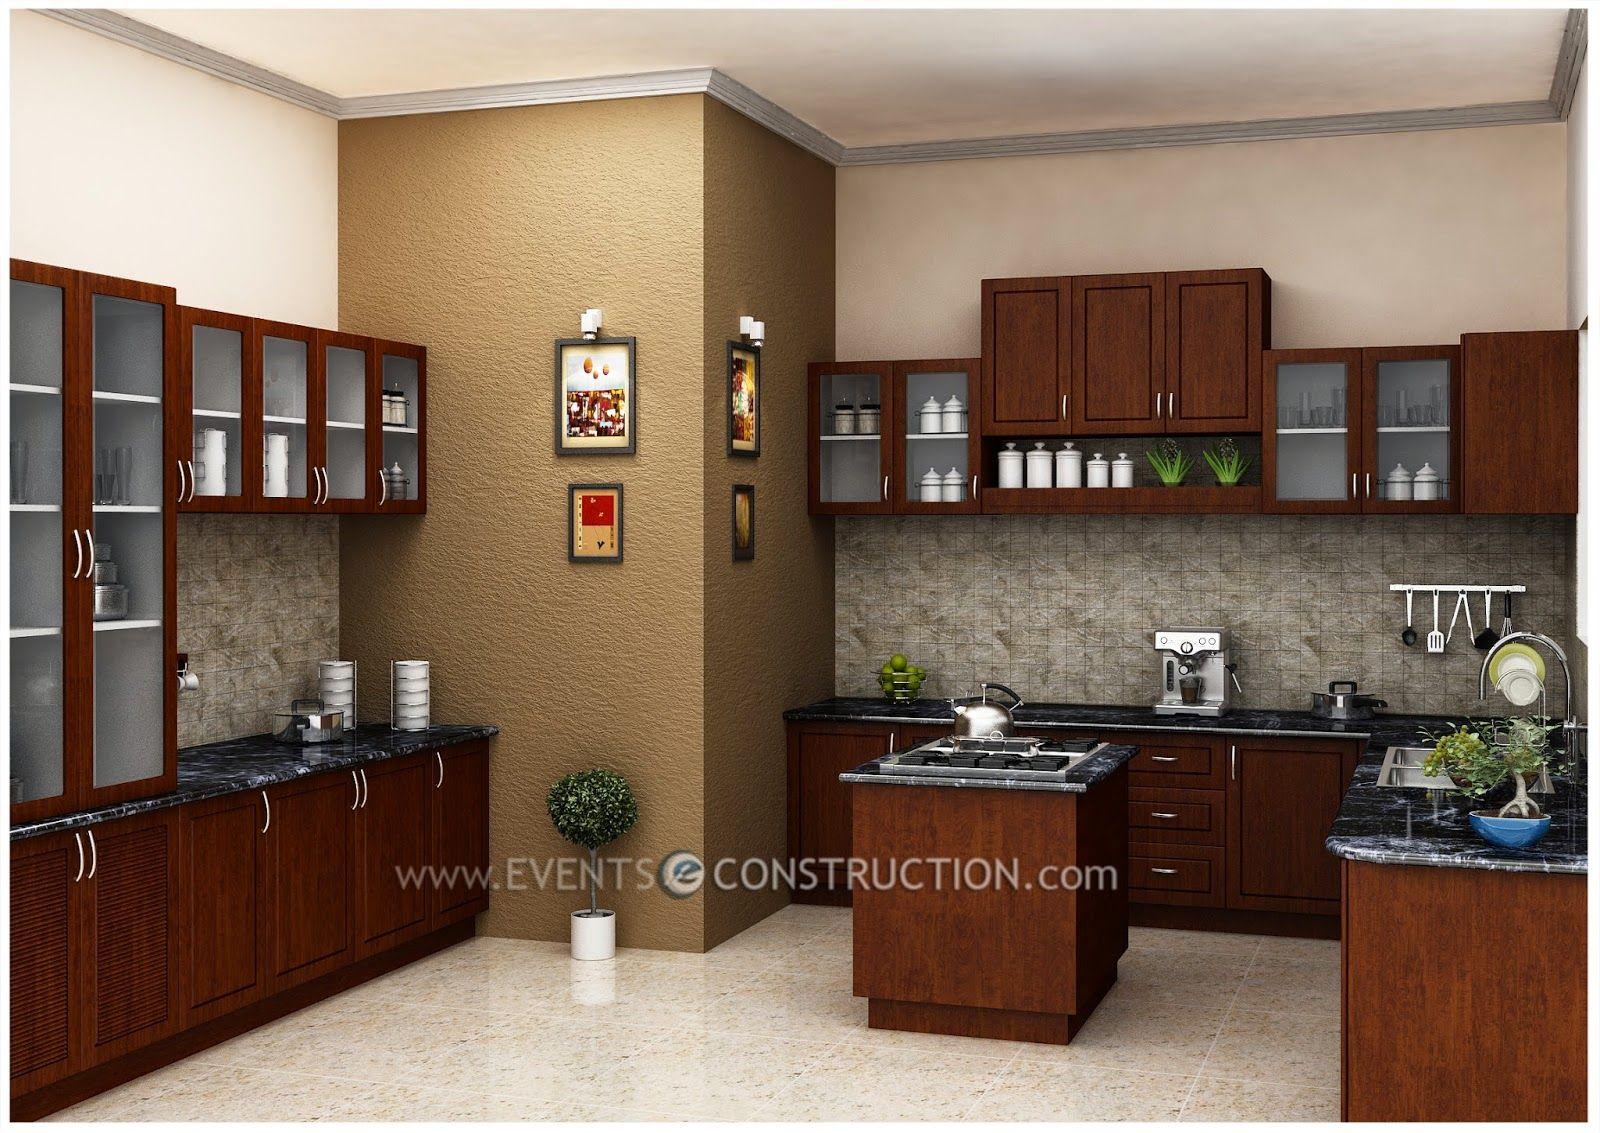 Kerala Tiles Designs For Kitchen 2017 Model Kitchen Design Home